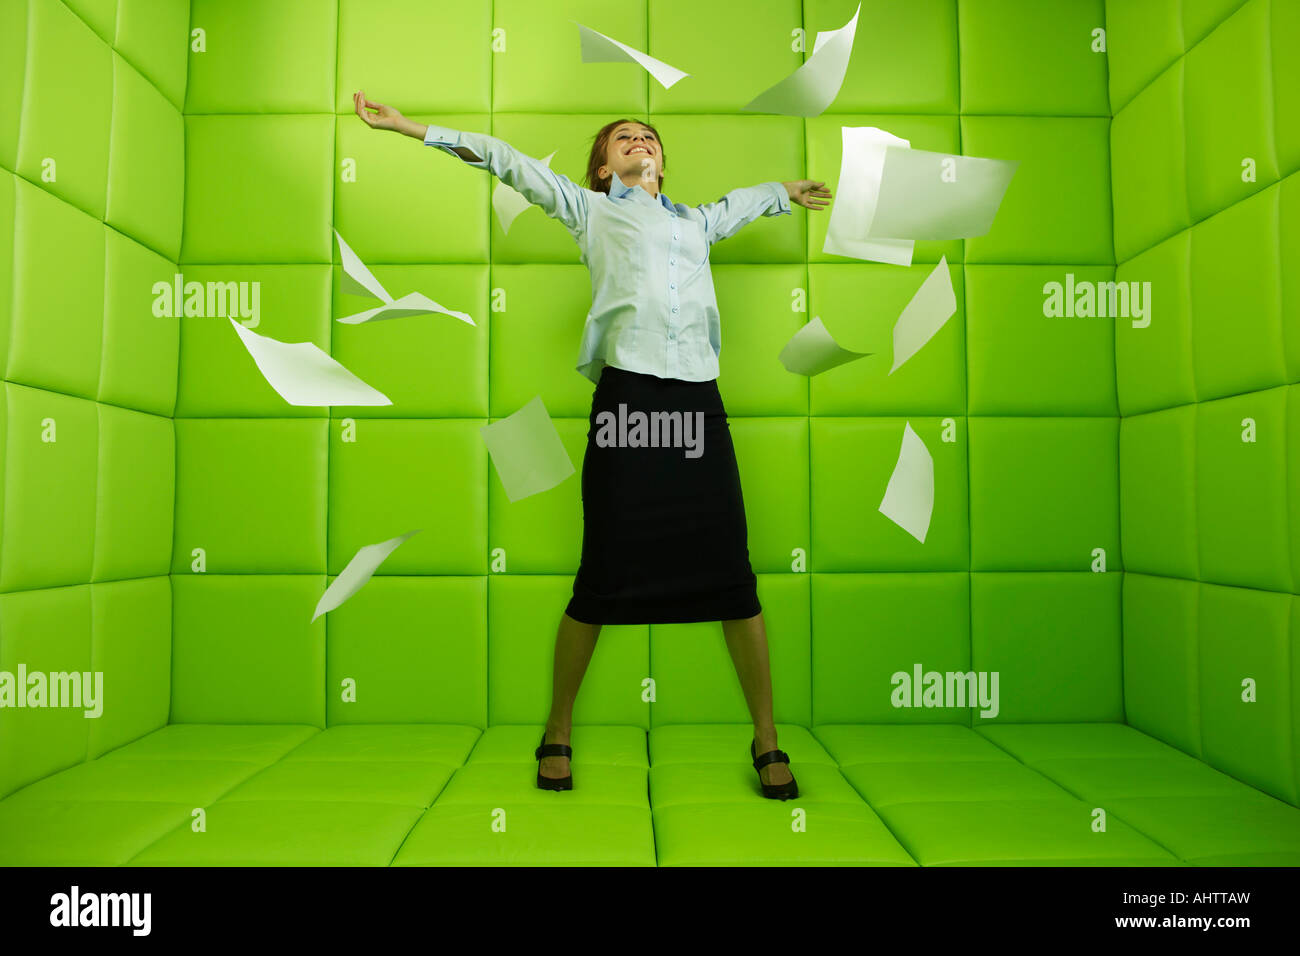 Frau warf Papiere rund um grüne Gummizelle Stockbild